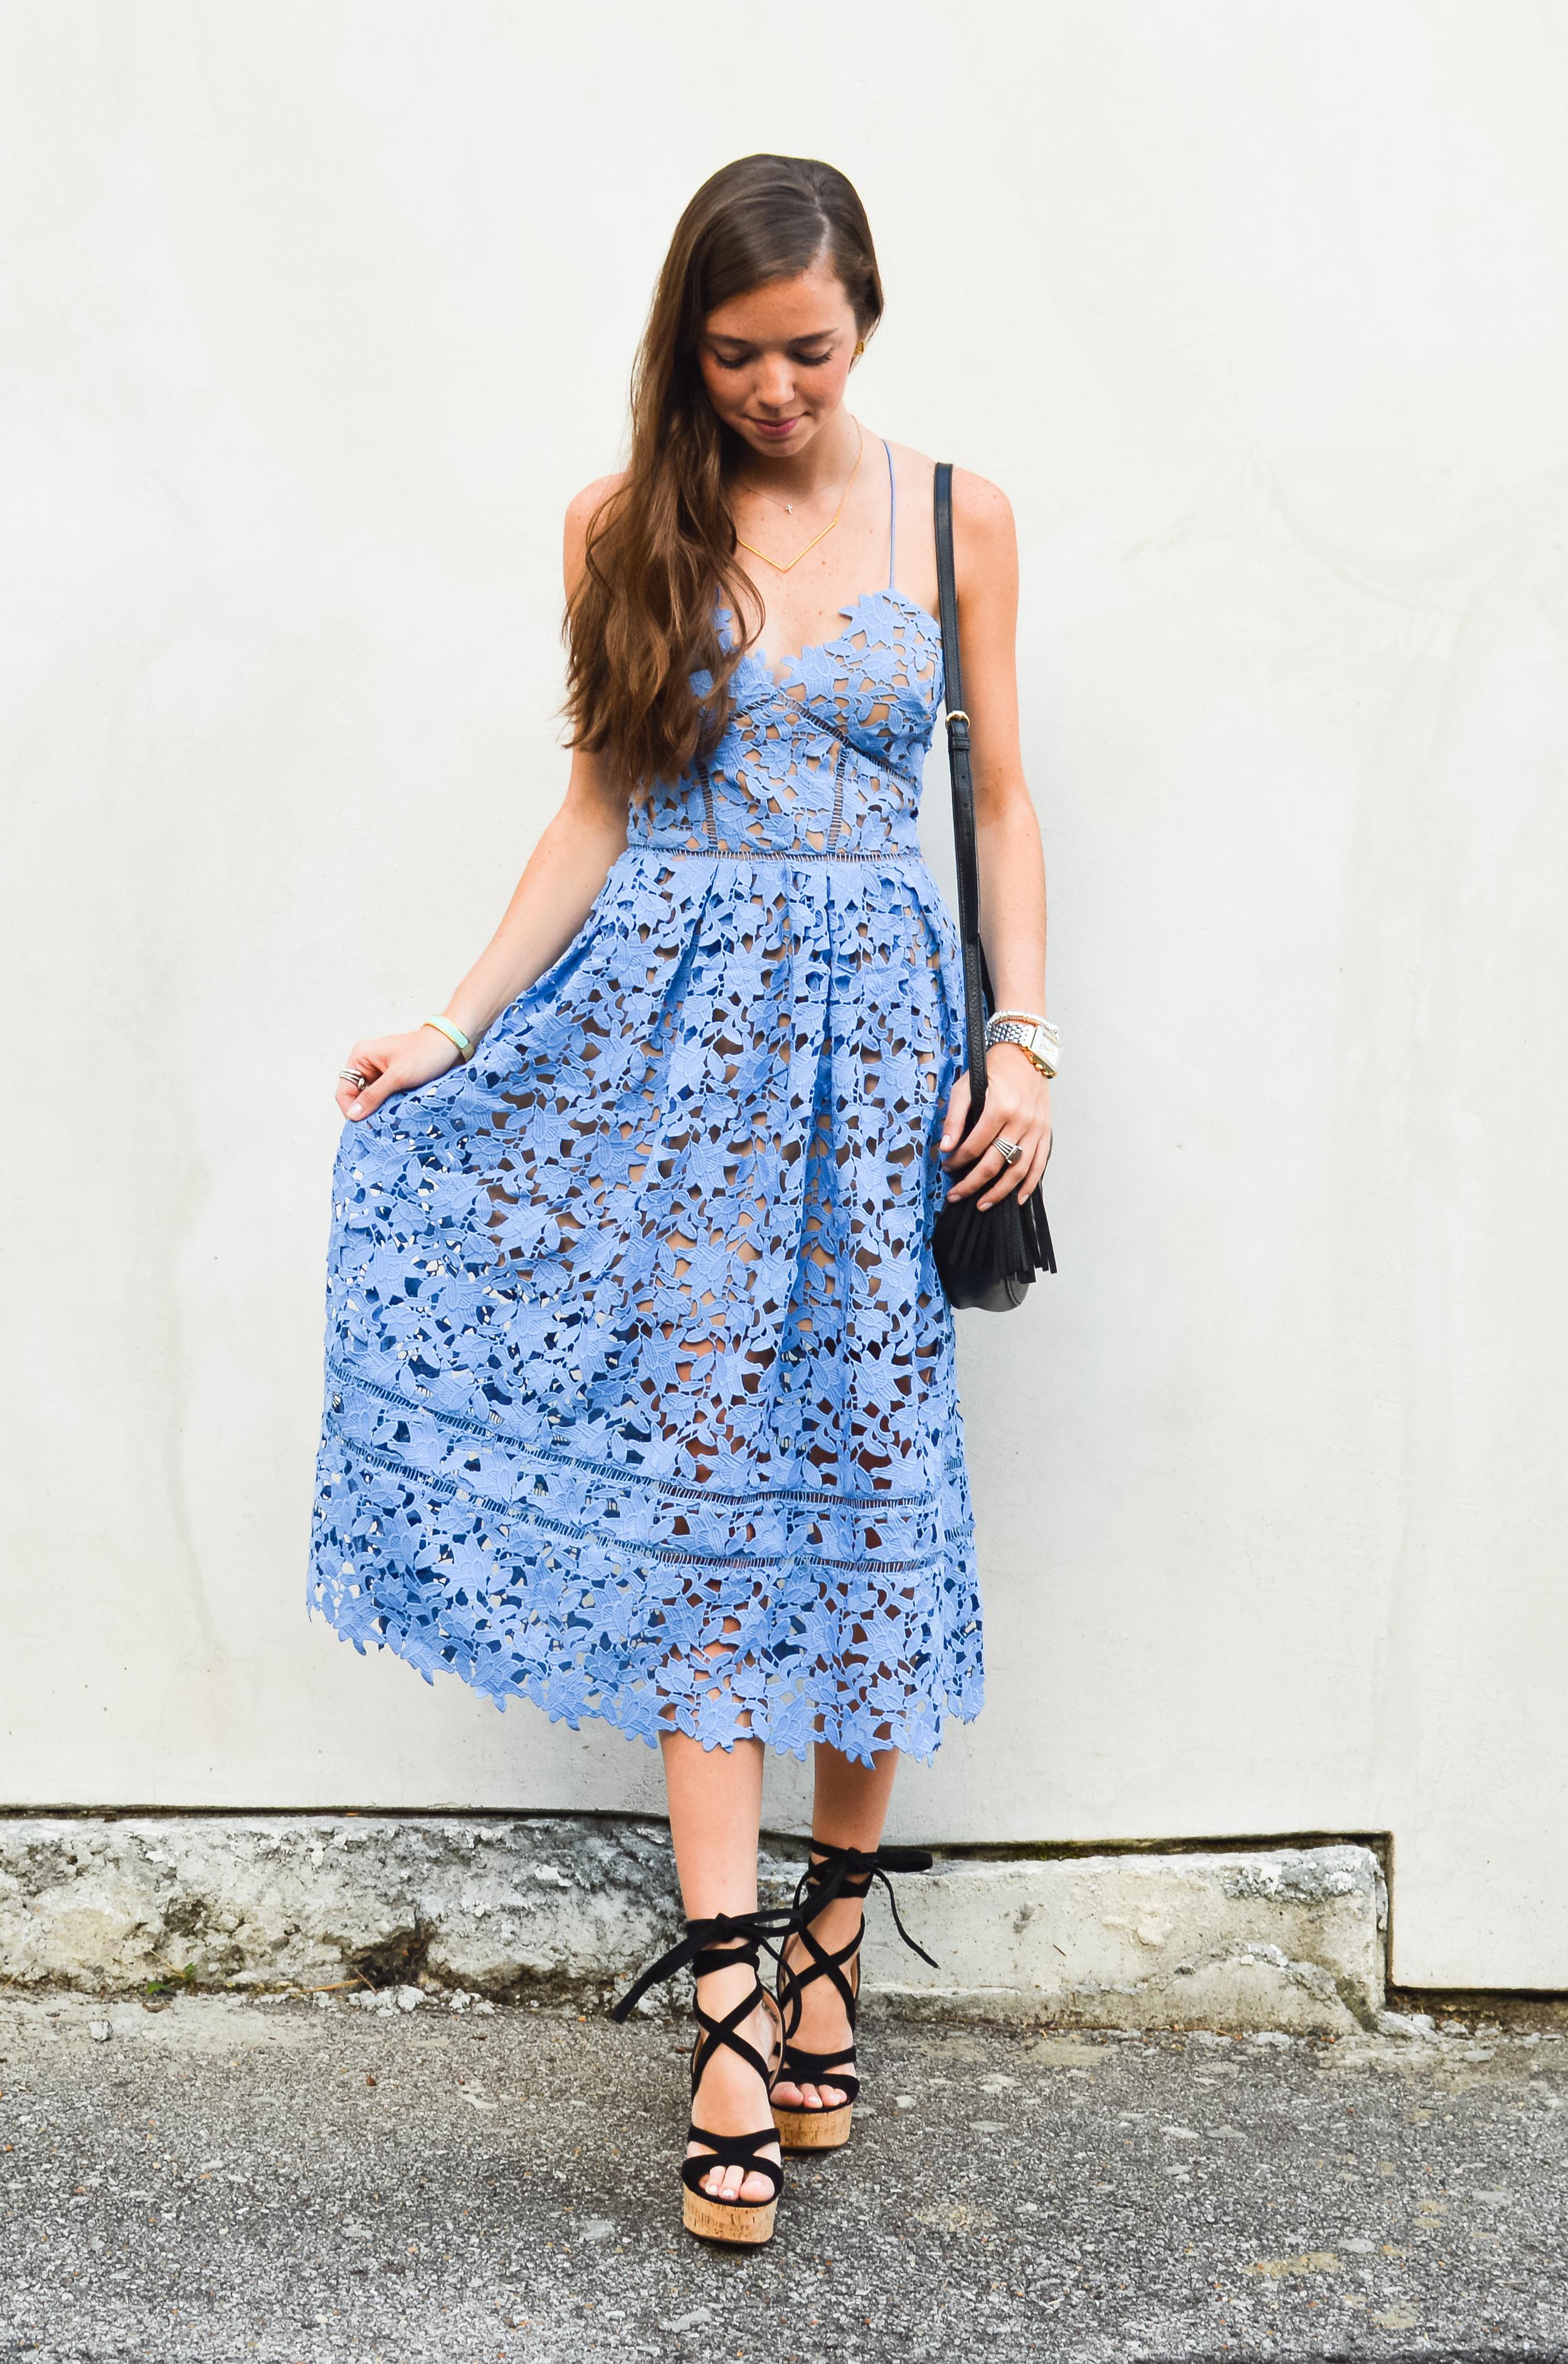 lcb_style_fashion_blogger_selfportrait_dress (18 of 48).jpg